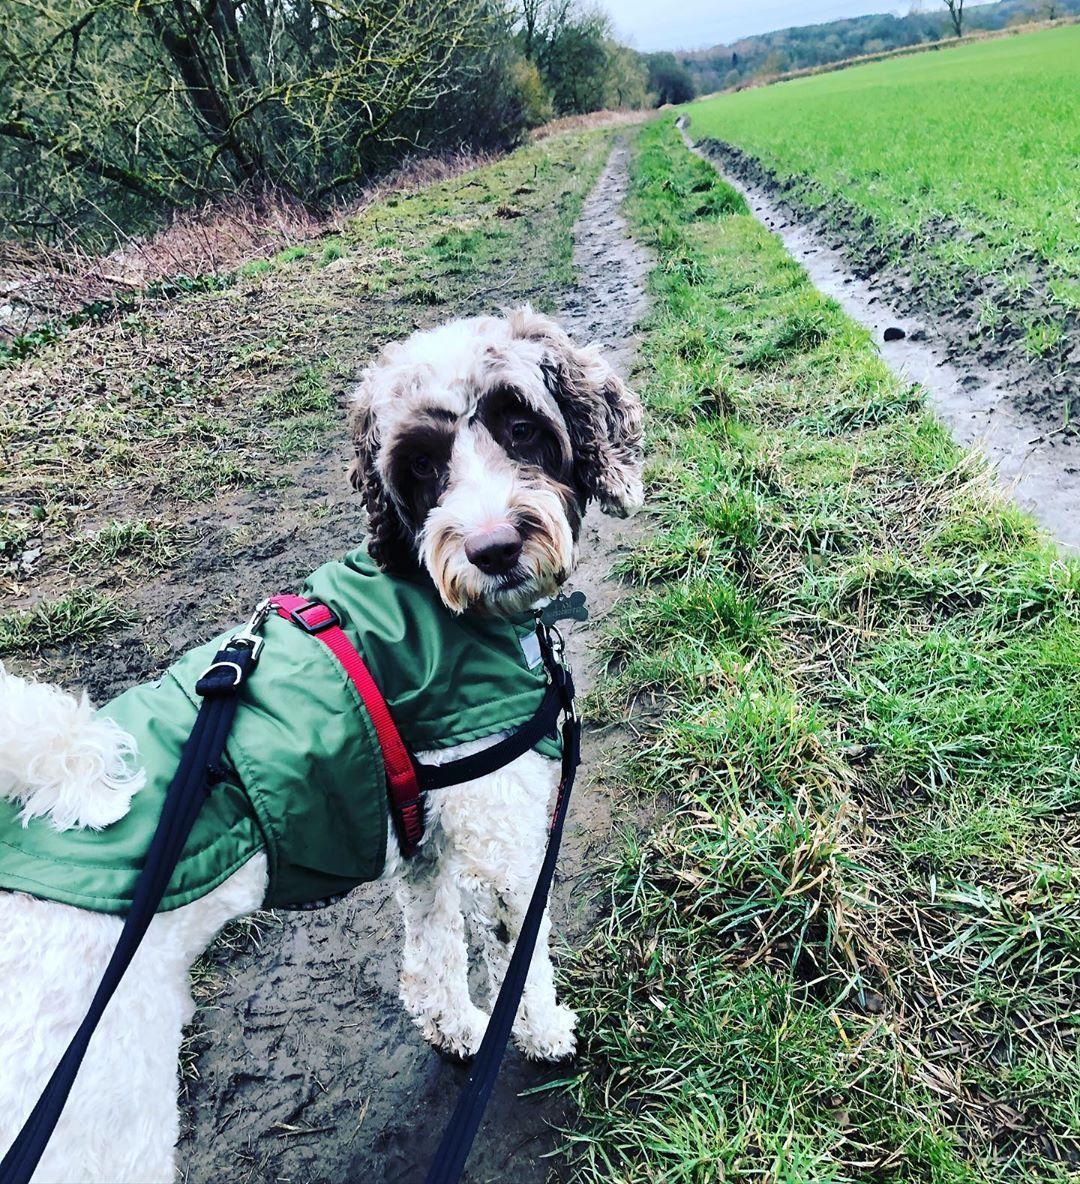 Walkies 🐾 . . . . . #walkies #muddypup #thegreatoutdoors #sproodle #springerpoo #poodlemix #poodle #springerspaniel #dog #puppy #doodle #doodlesofinstagram